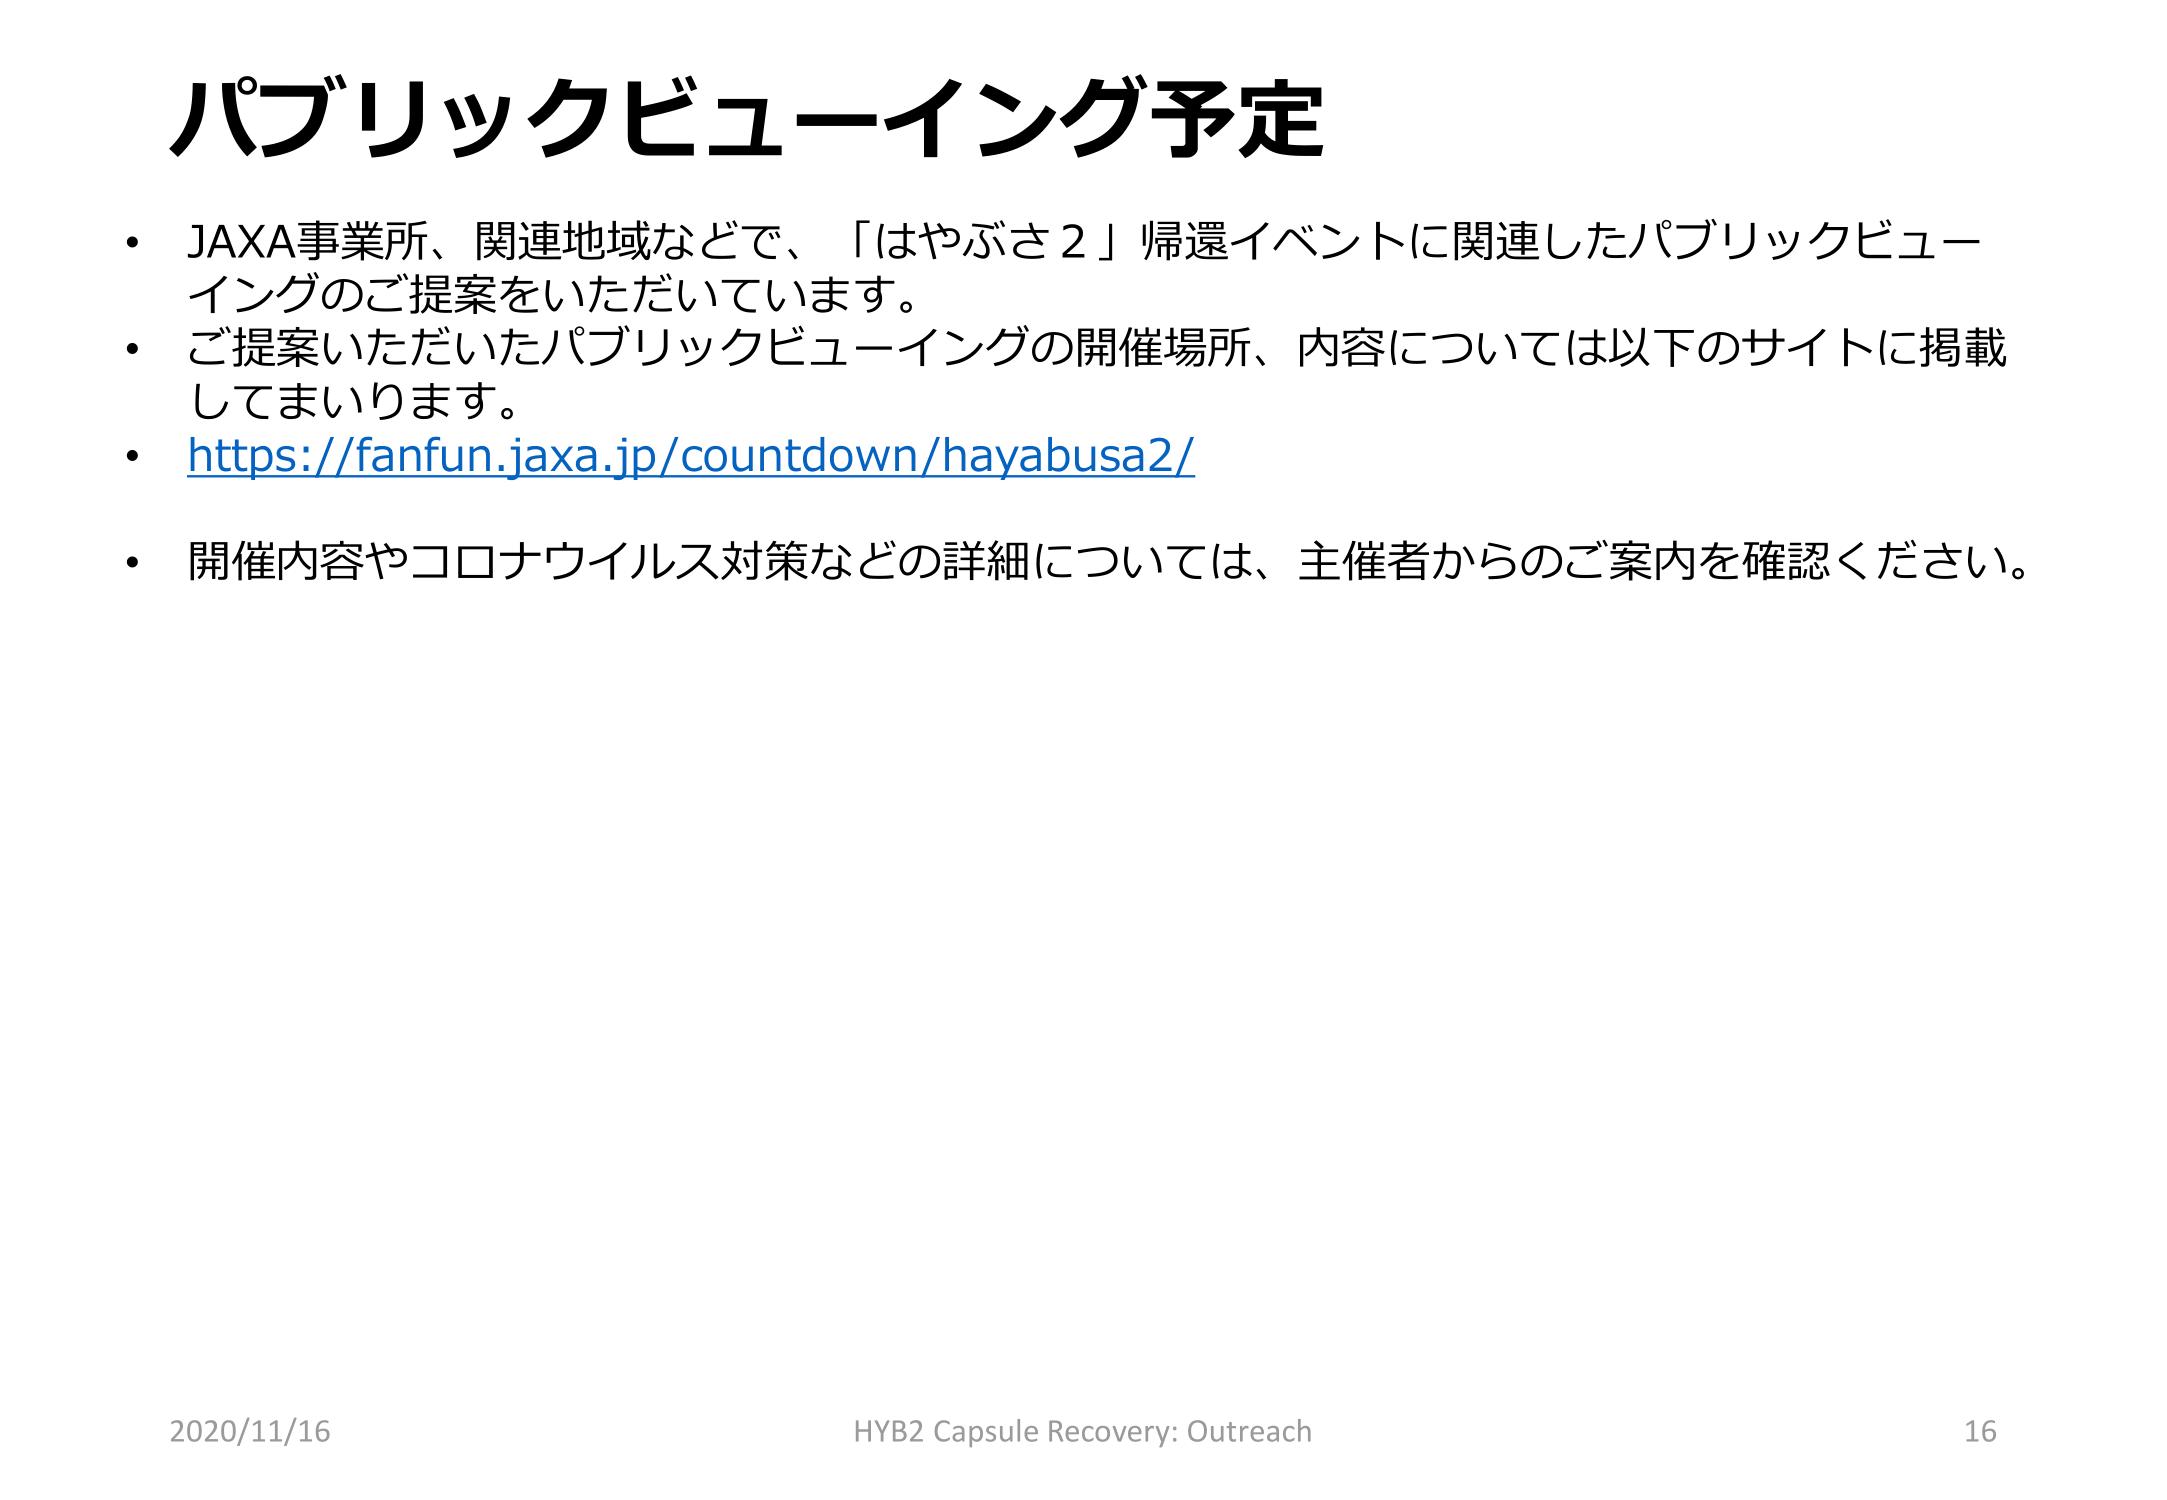 f:id:Imamura:20201117222344p:plain